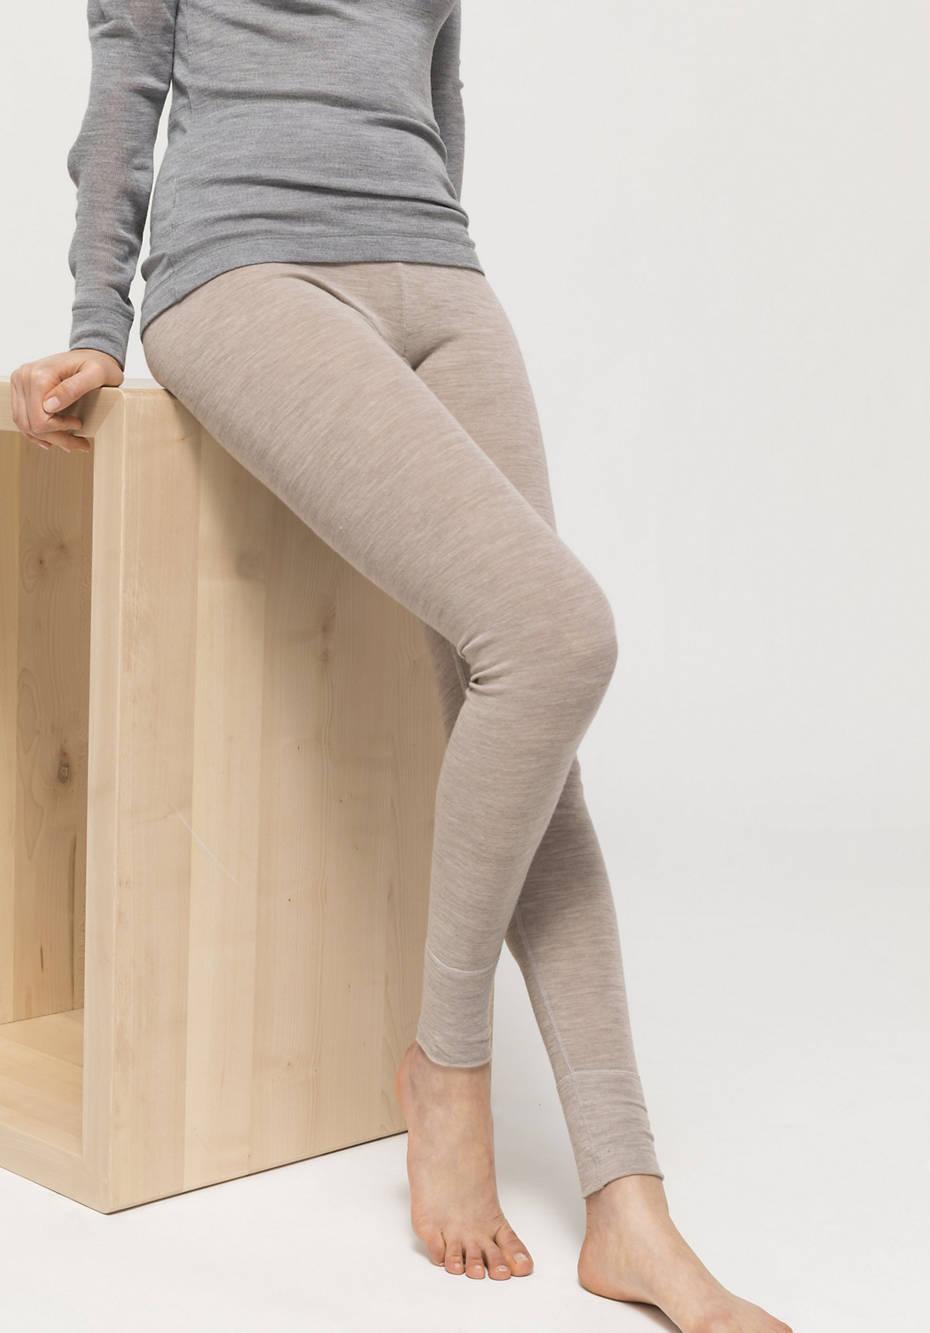 PureMIX long pants made of organic merino wool with silk